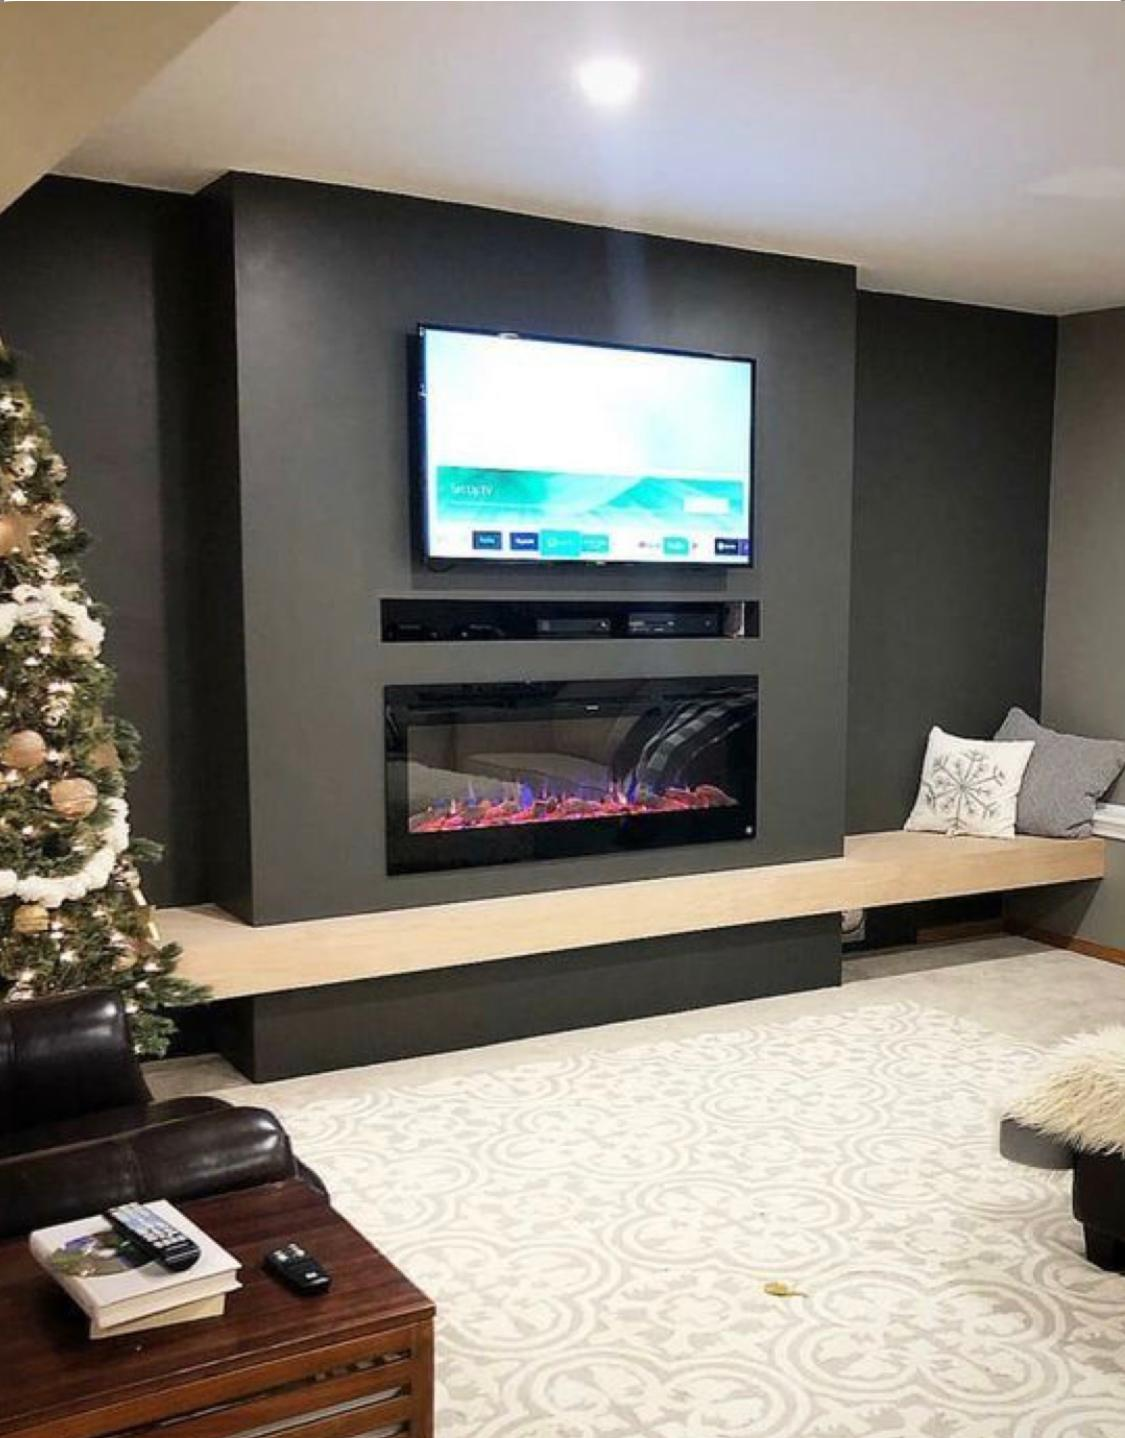 Tv üniteli elektirikli şömine modeli bş 423